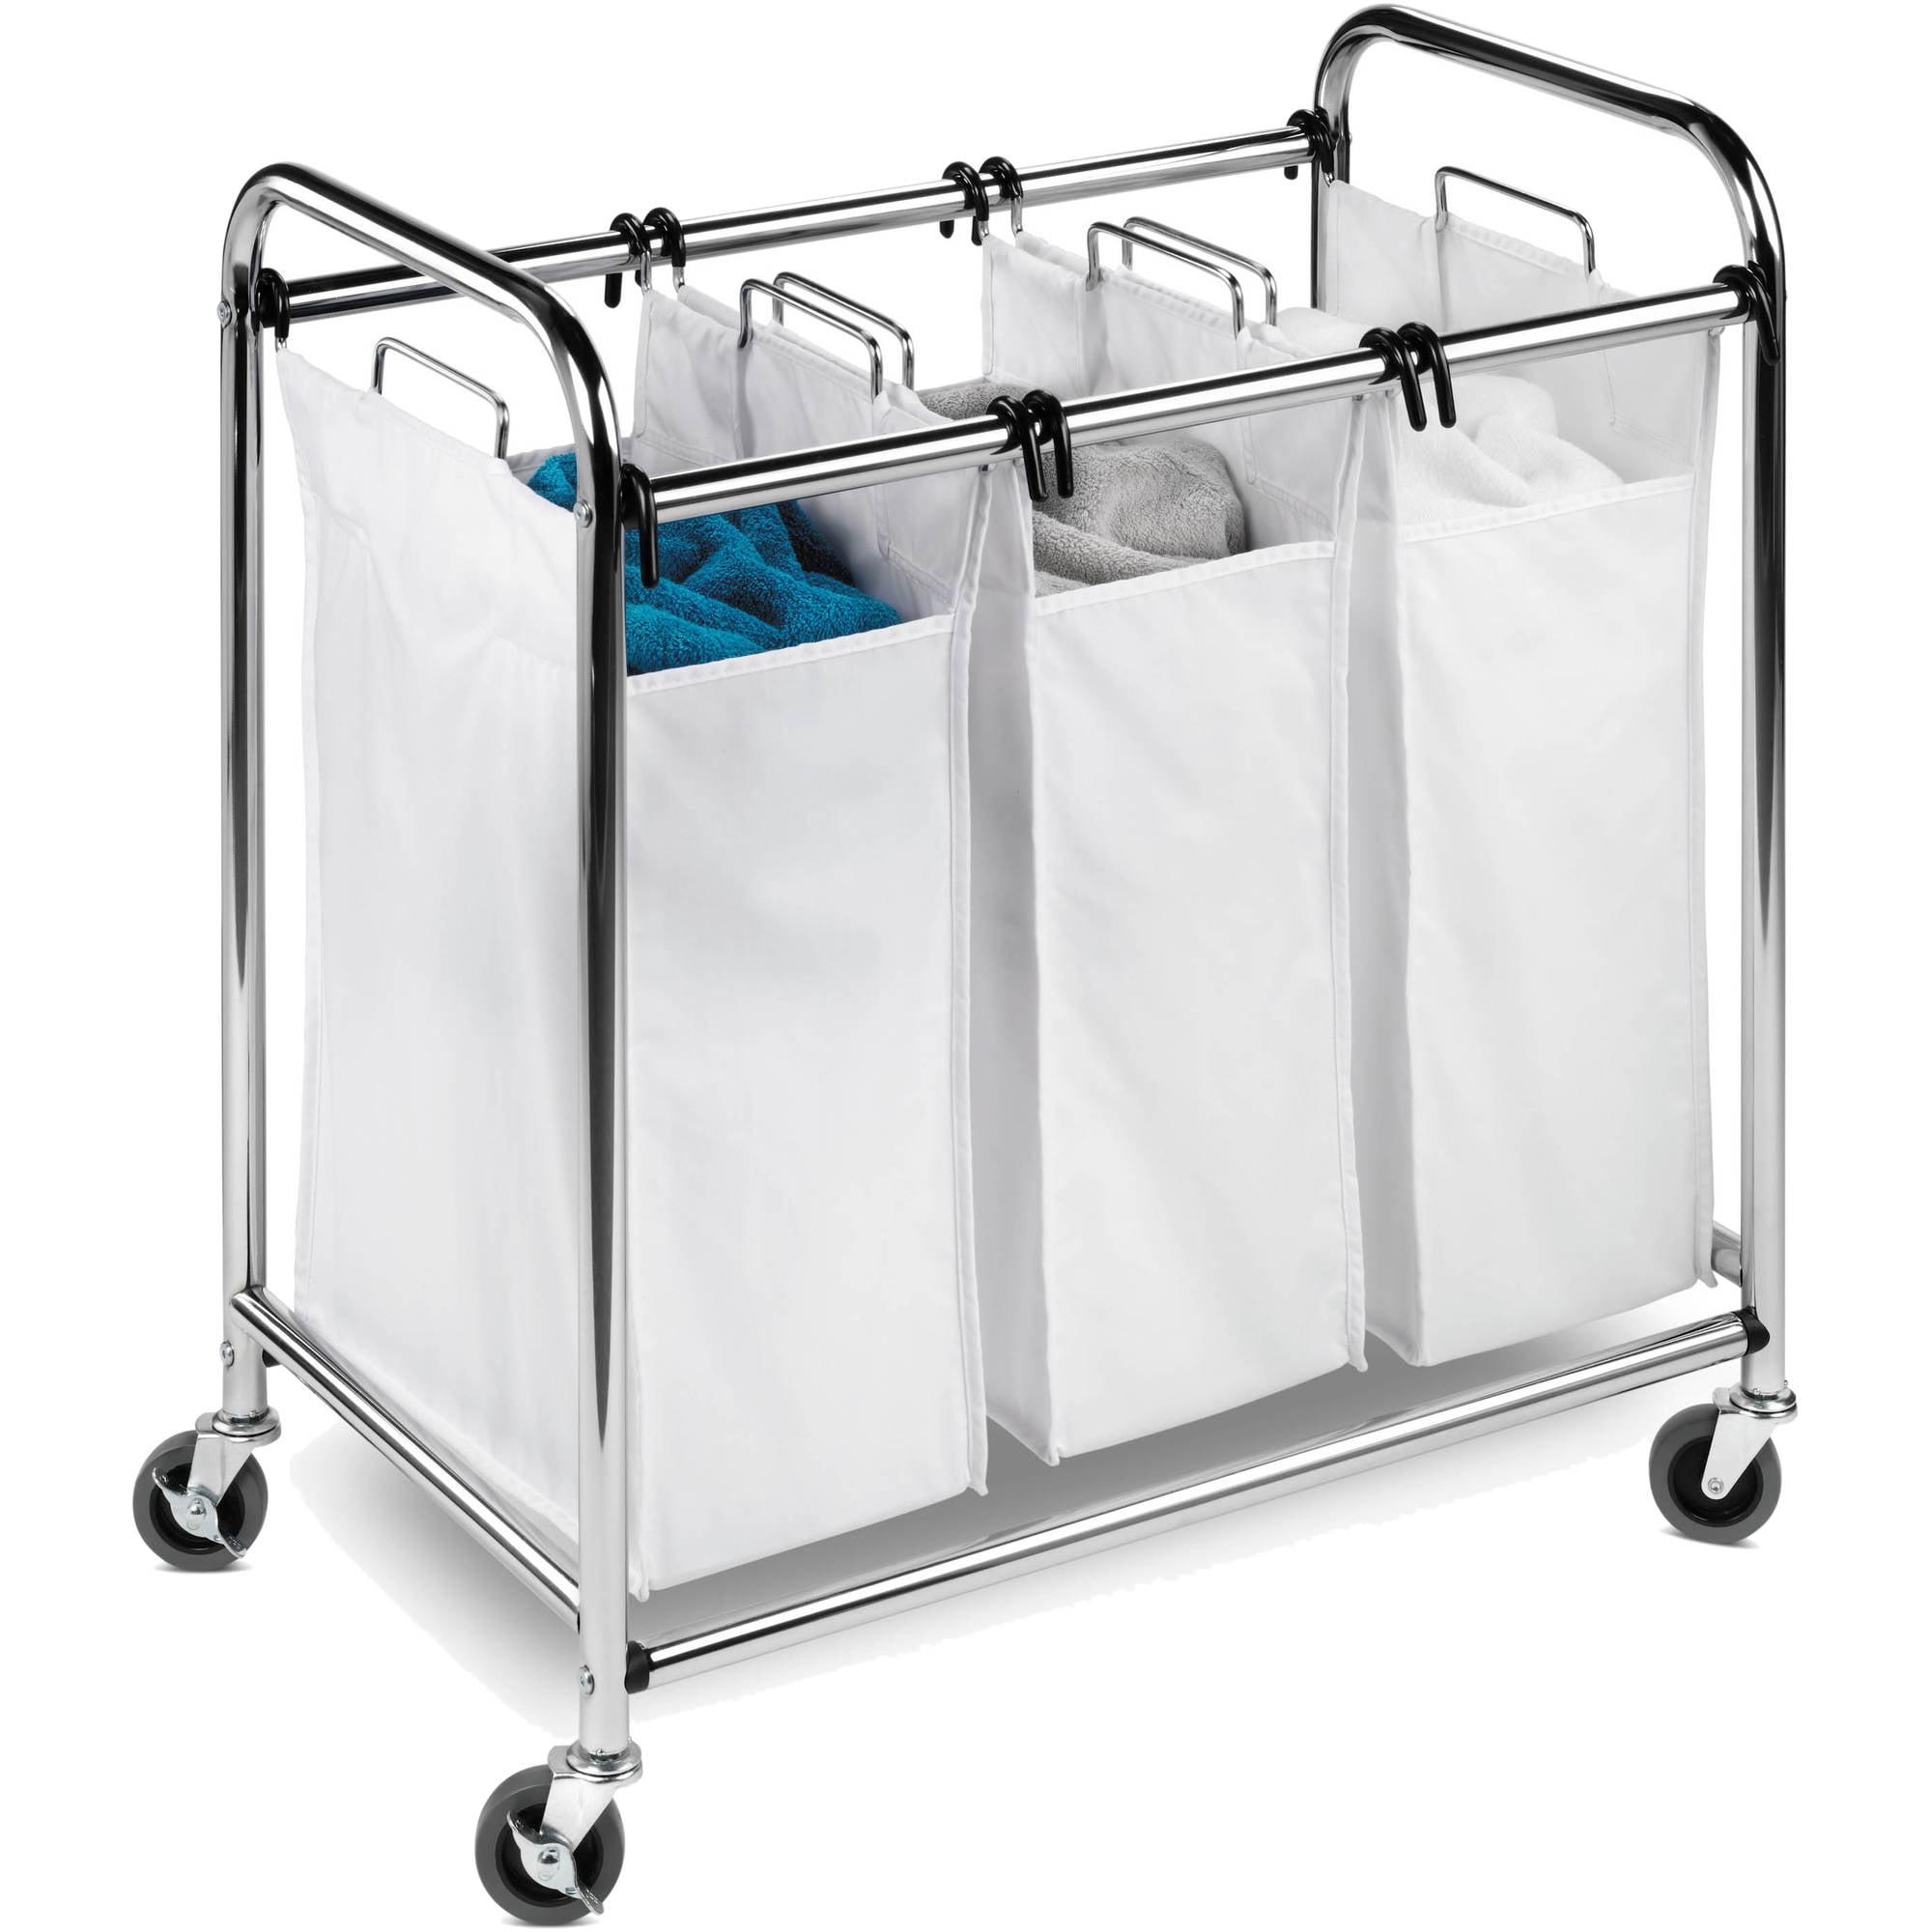 storage & organization - every day low prices | walmart